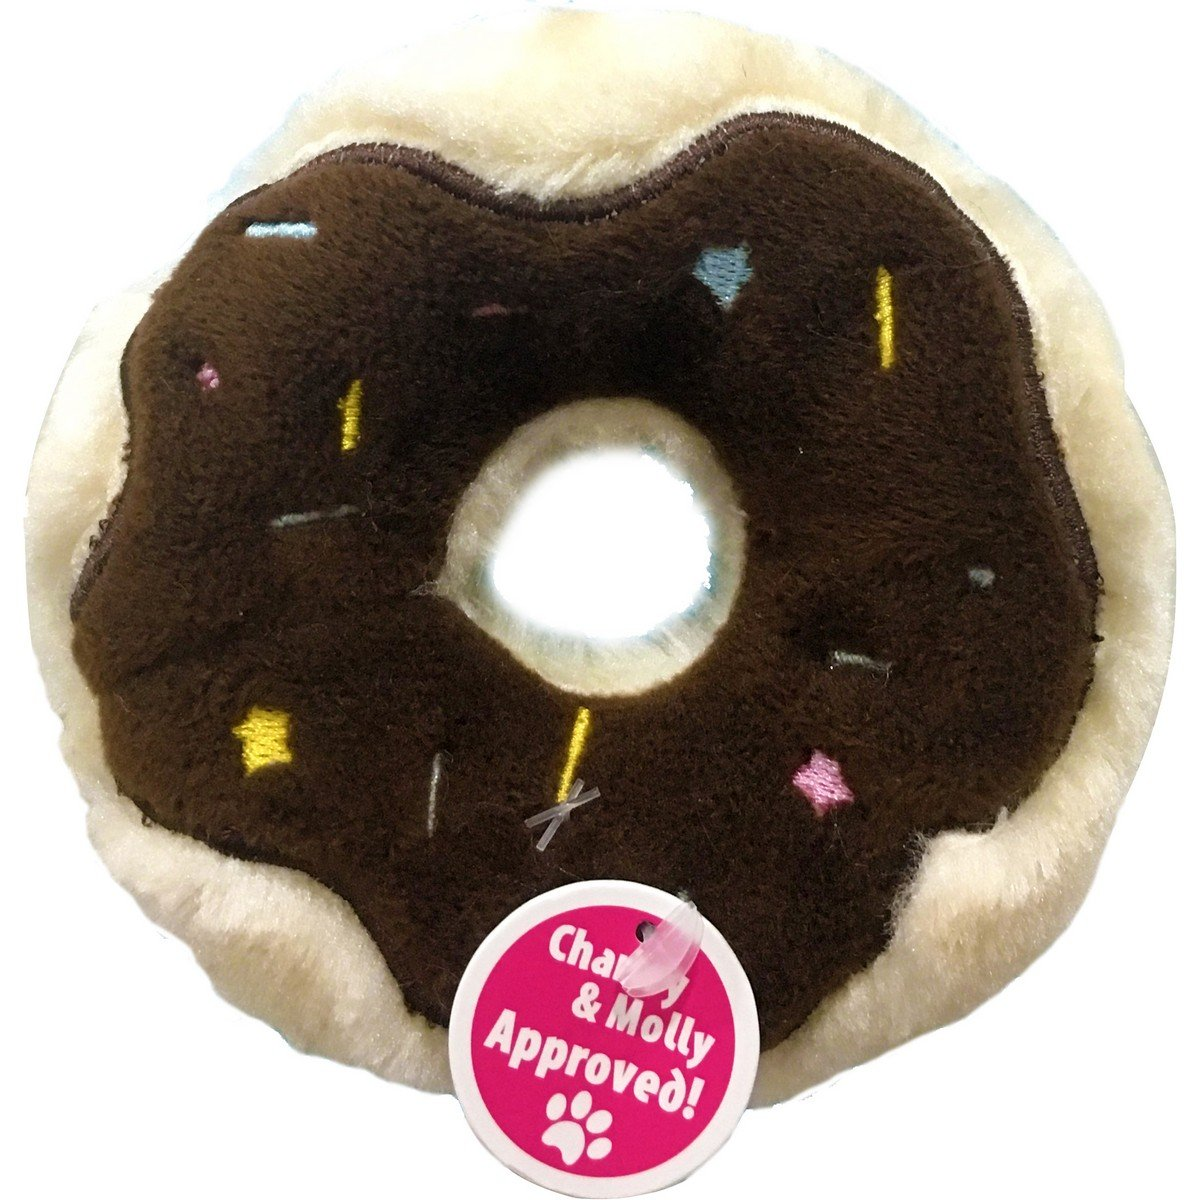 Afbeelding van Charley & Molley Comfort Plush Donut 10cm